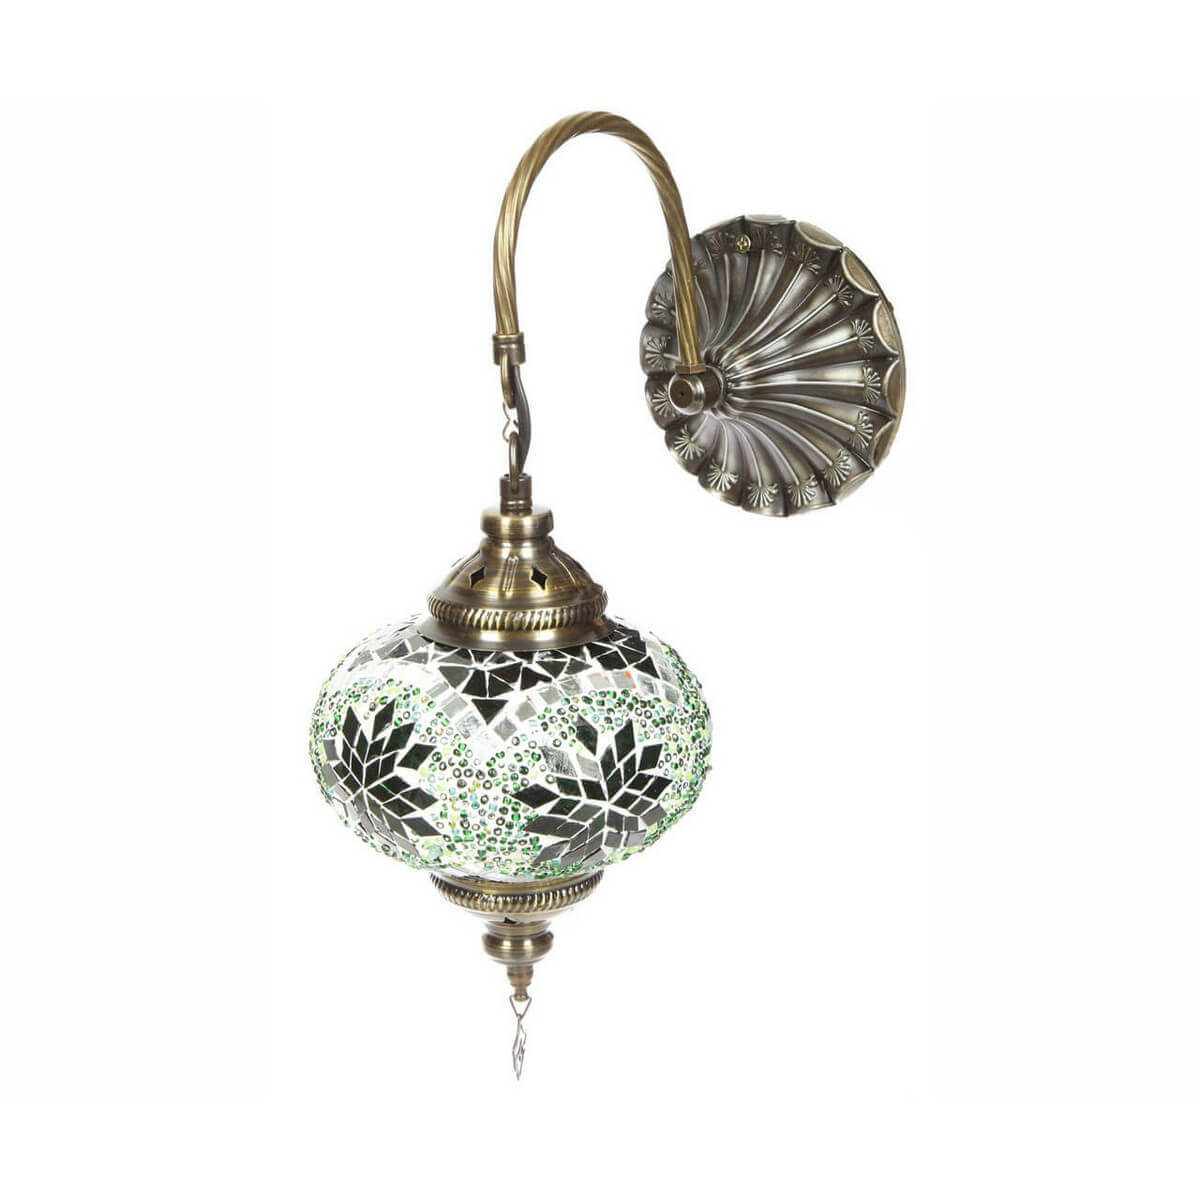 цена Бра Kink Light Марокко 0815T,07 в интернет-магазинах